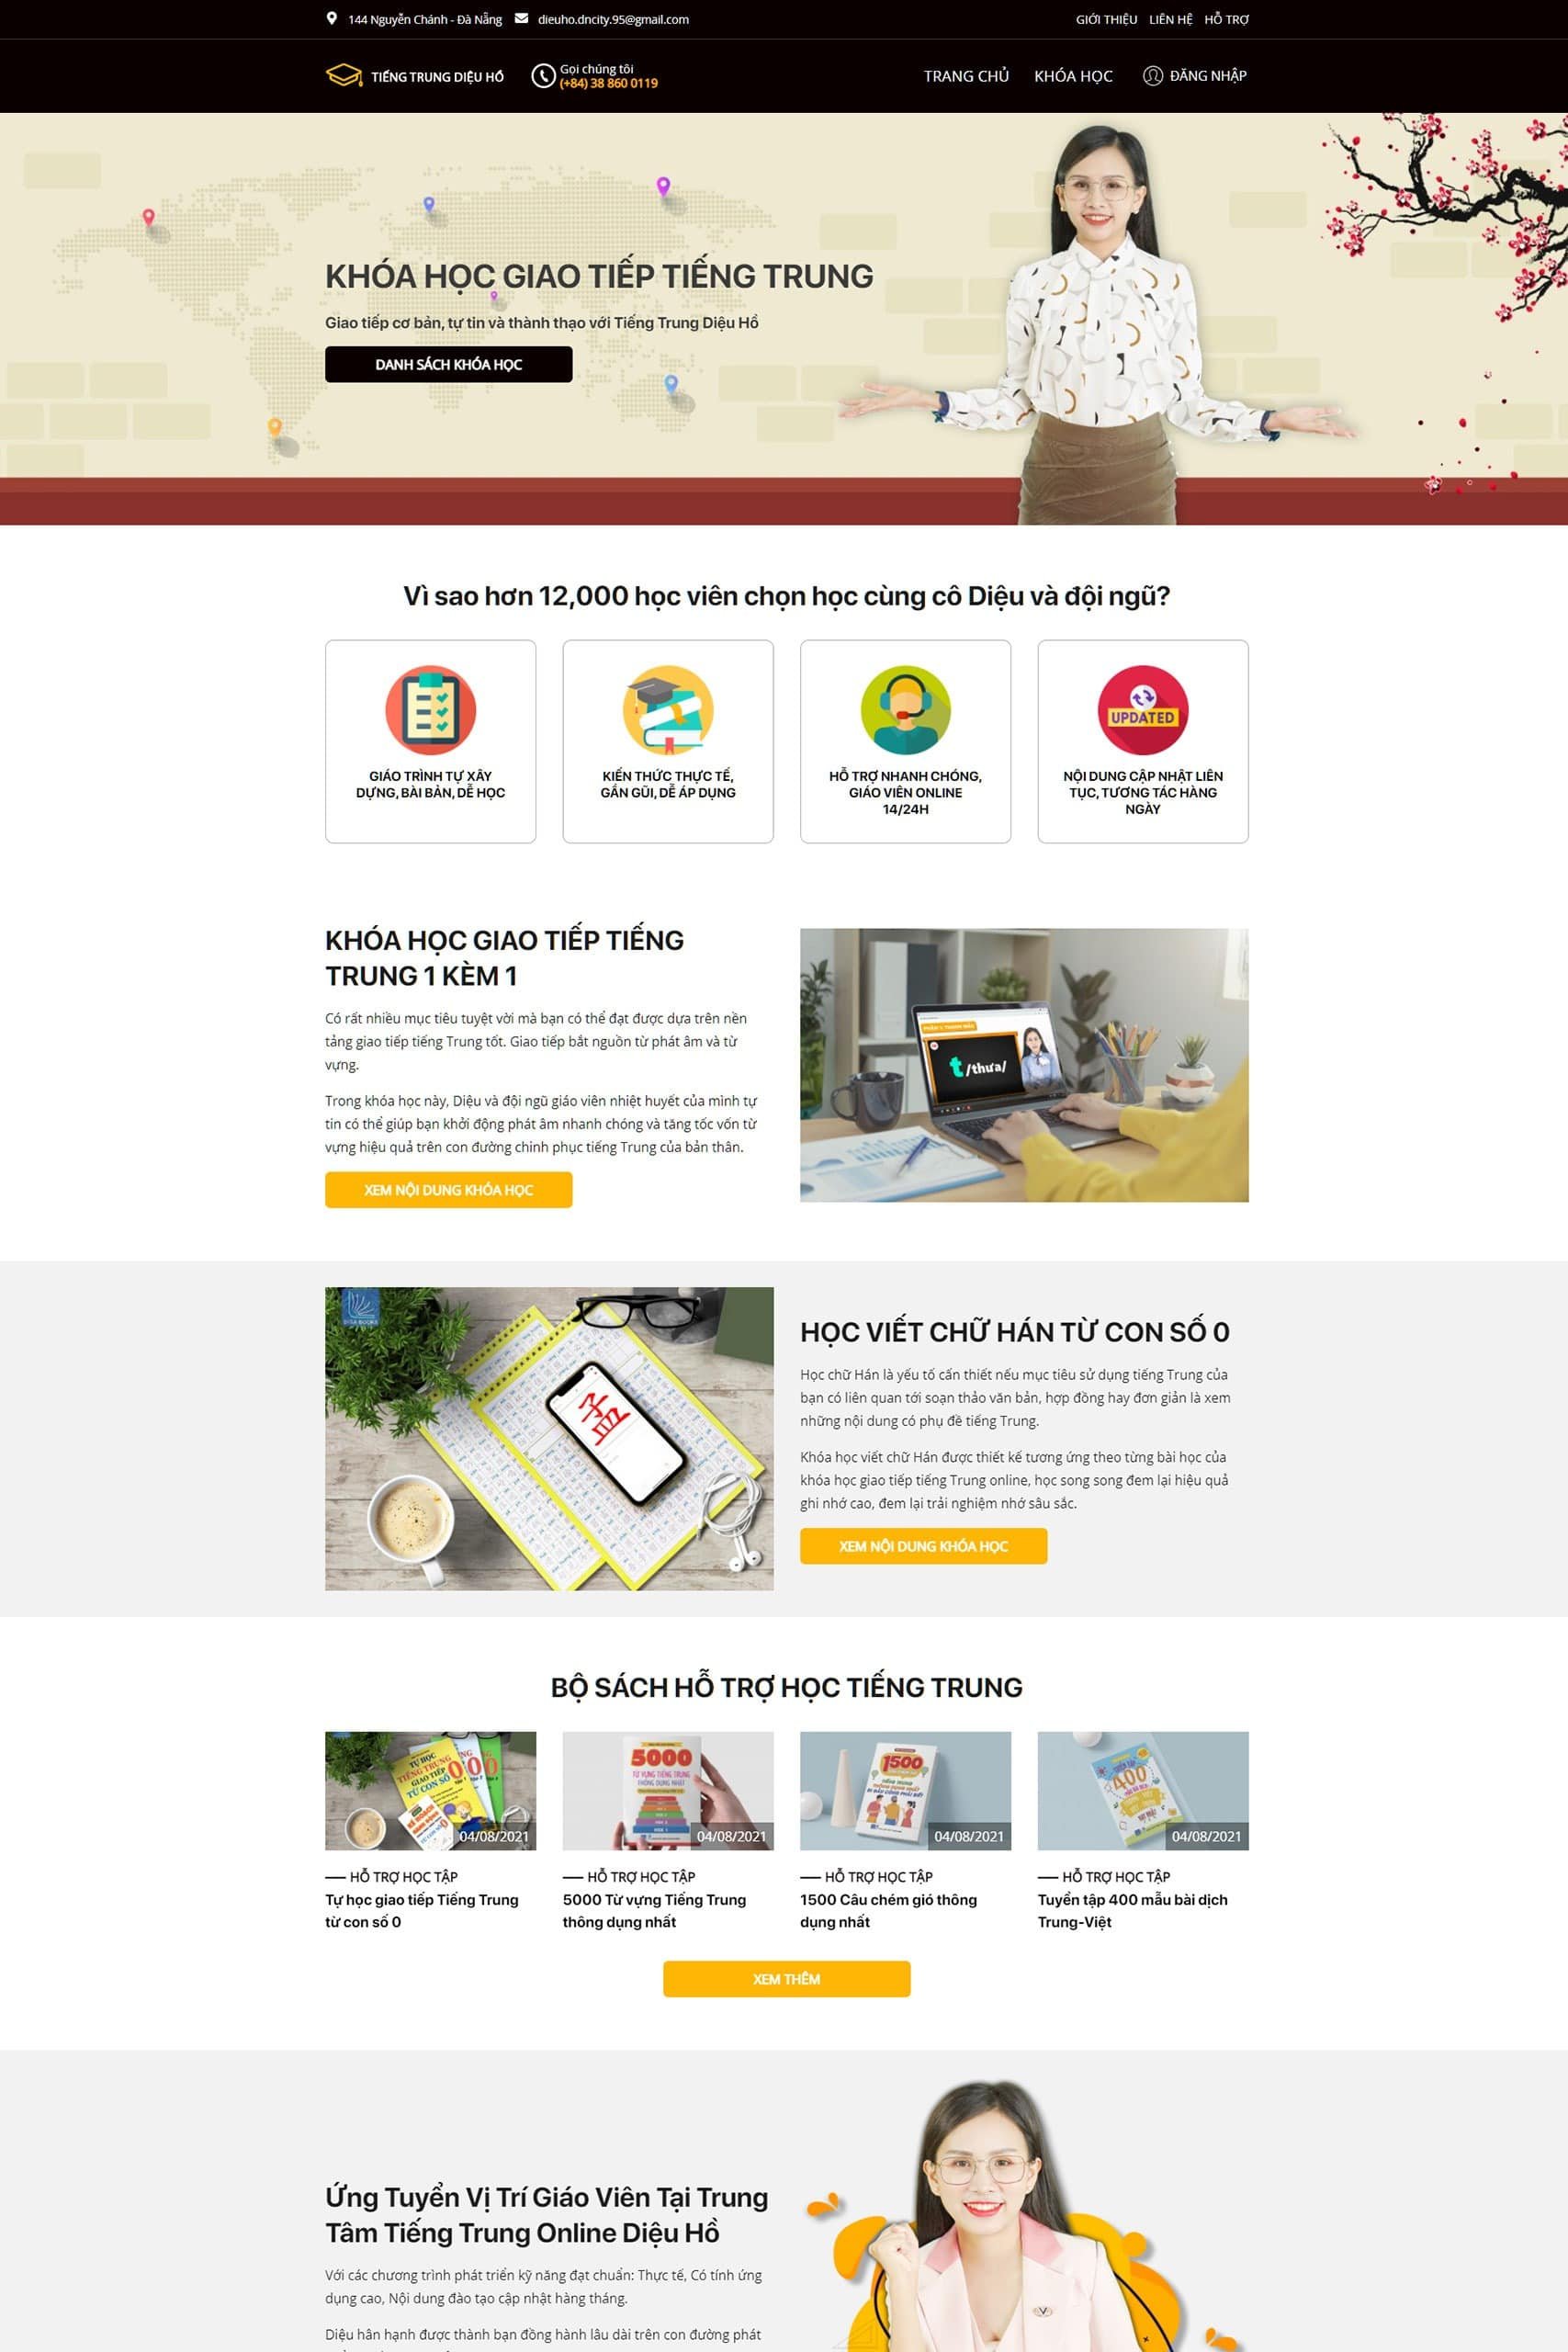 Giao diện website Tiếng Trung Diệu Hồ